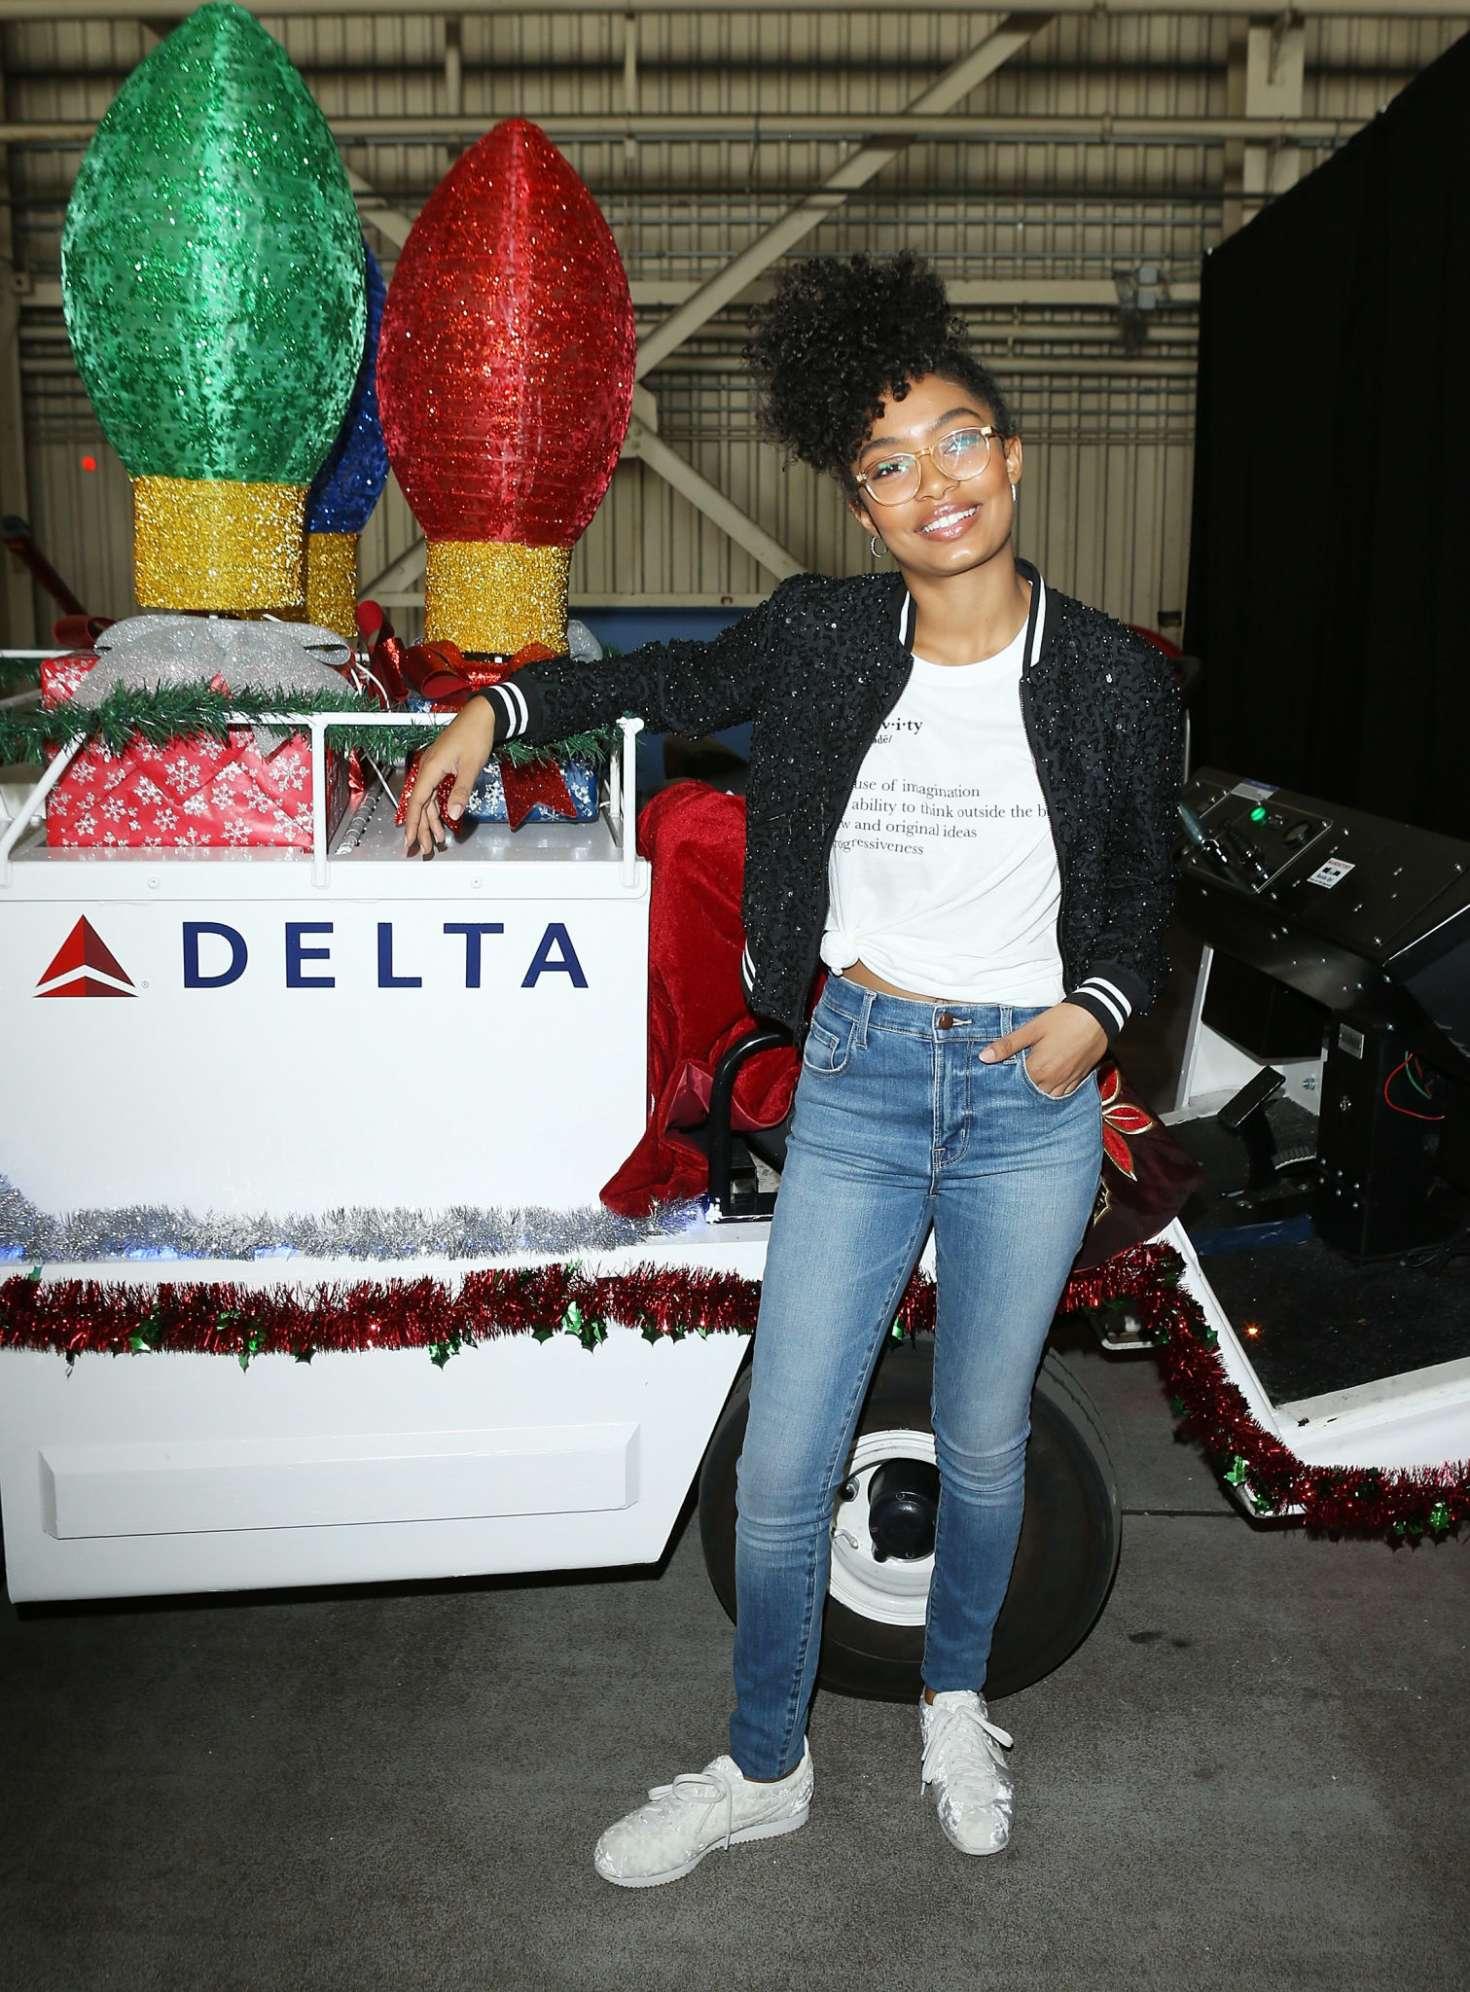 Yara Shahidi - 7th Annual 'Holiday In The Hangar' at LAX Airport in LA